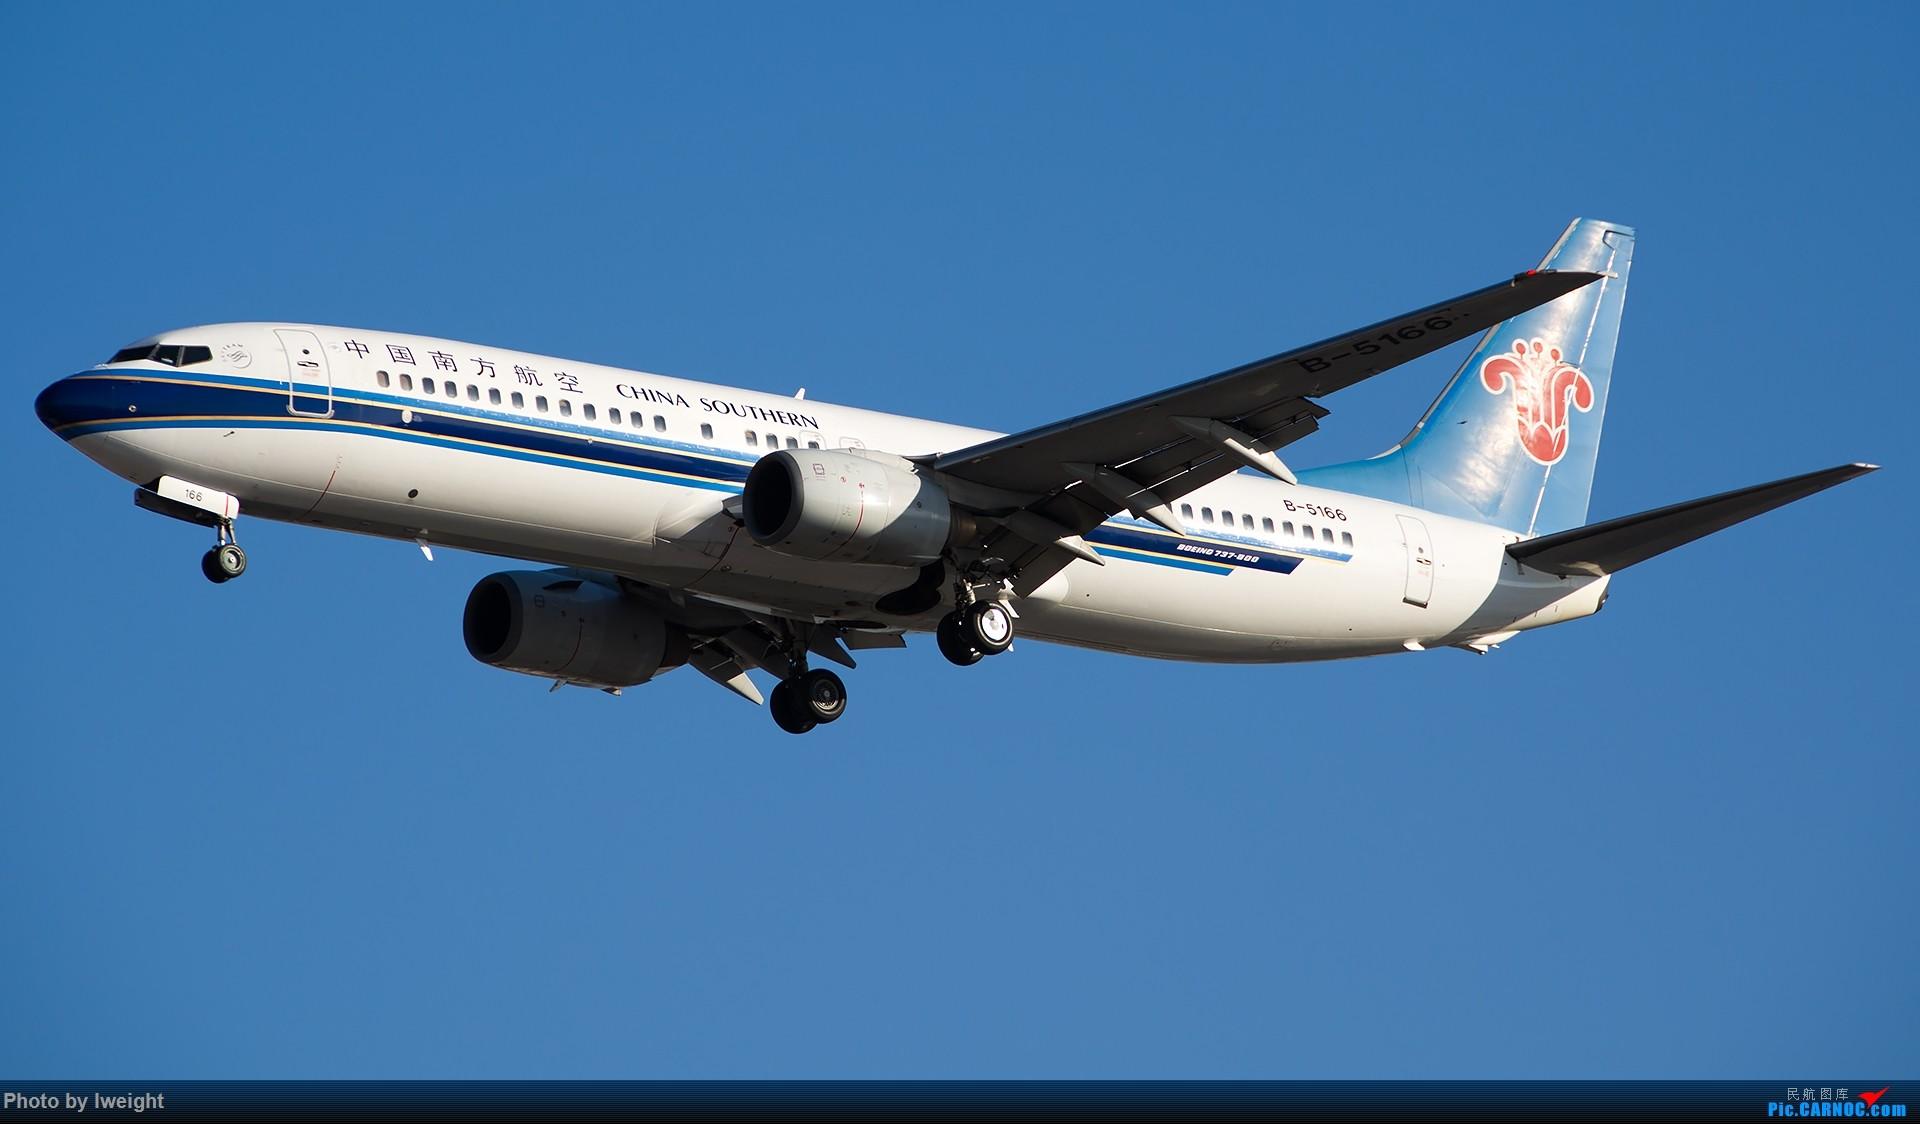 Re:[原创]北京难得的好天气,随手拍了一些渣图【2015-01-27】 BOEING 737-800 B-5166 中国北京首都国际机场